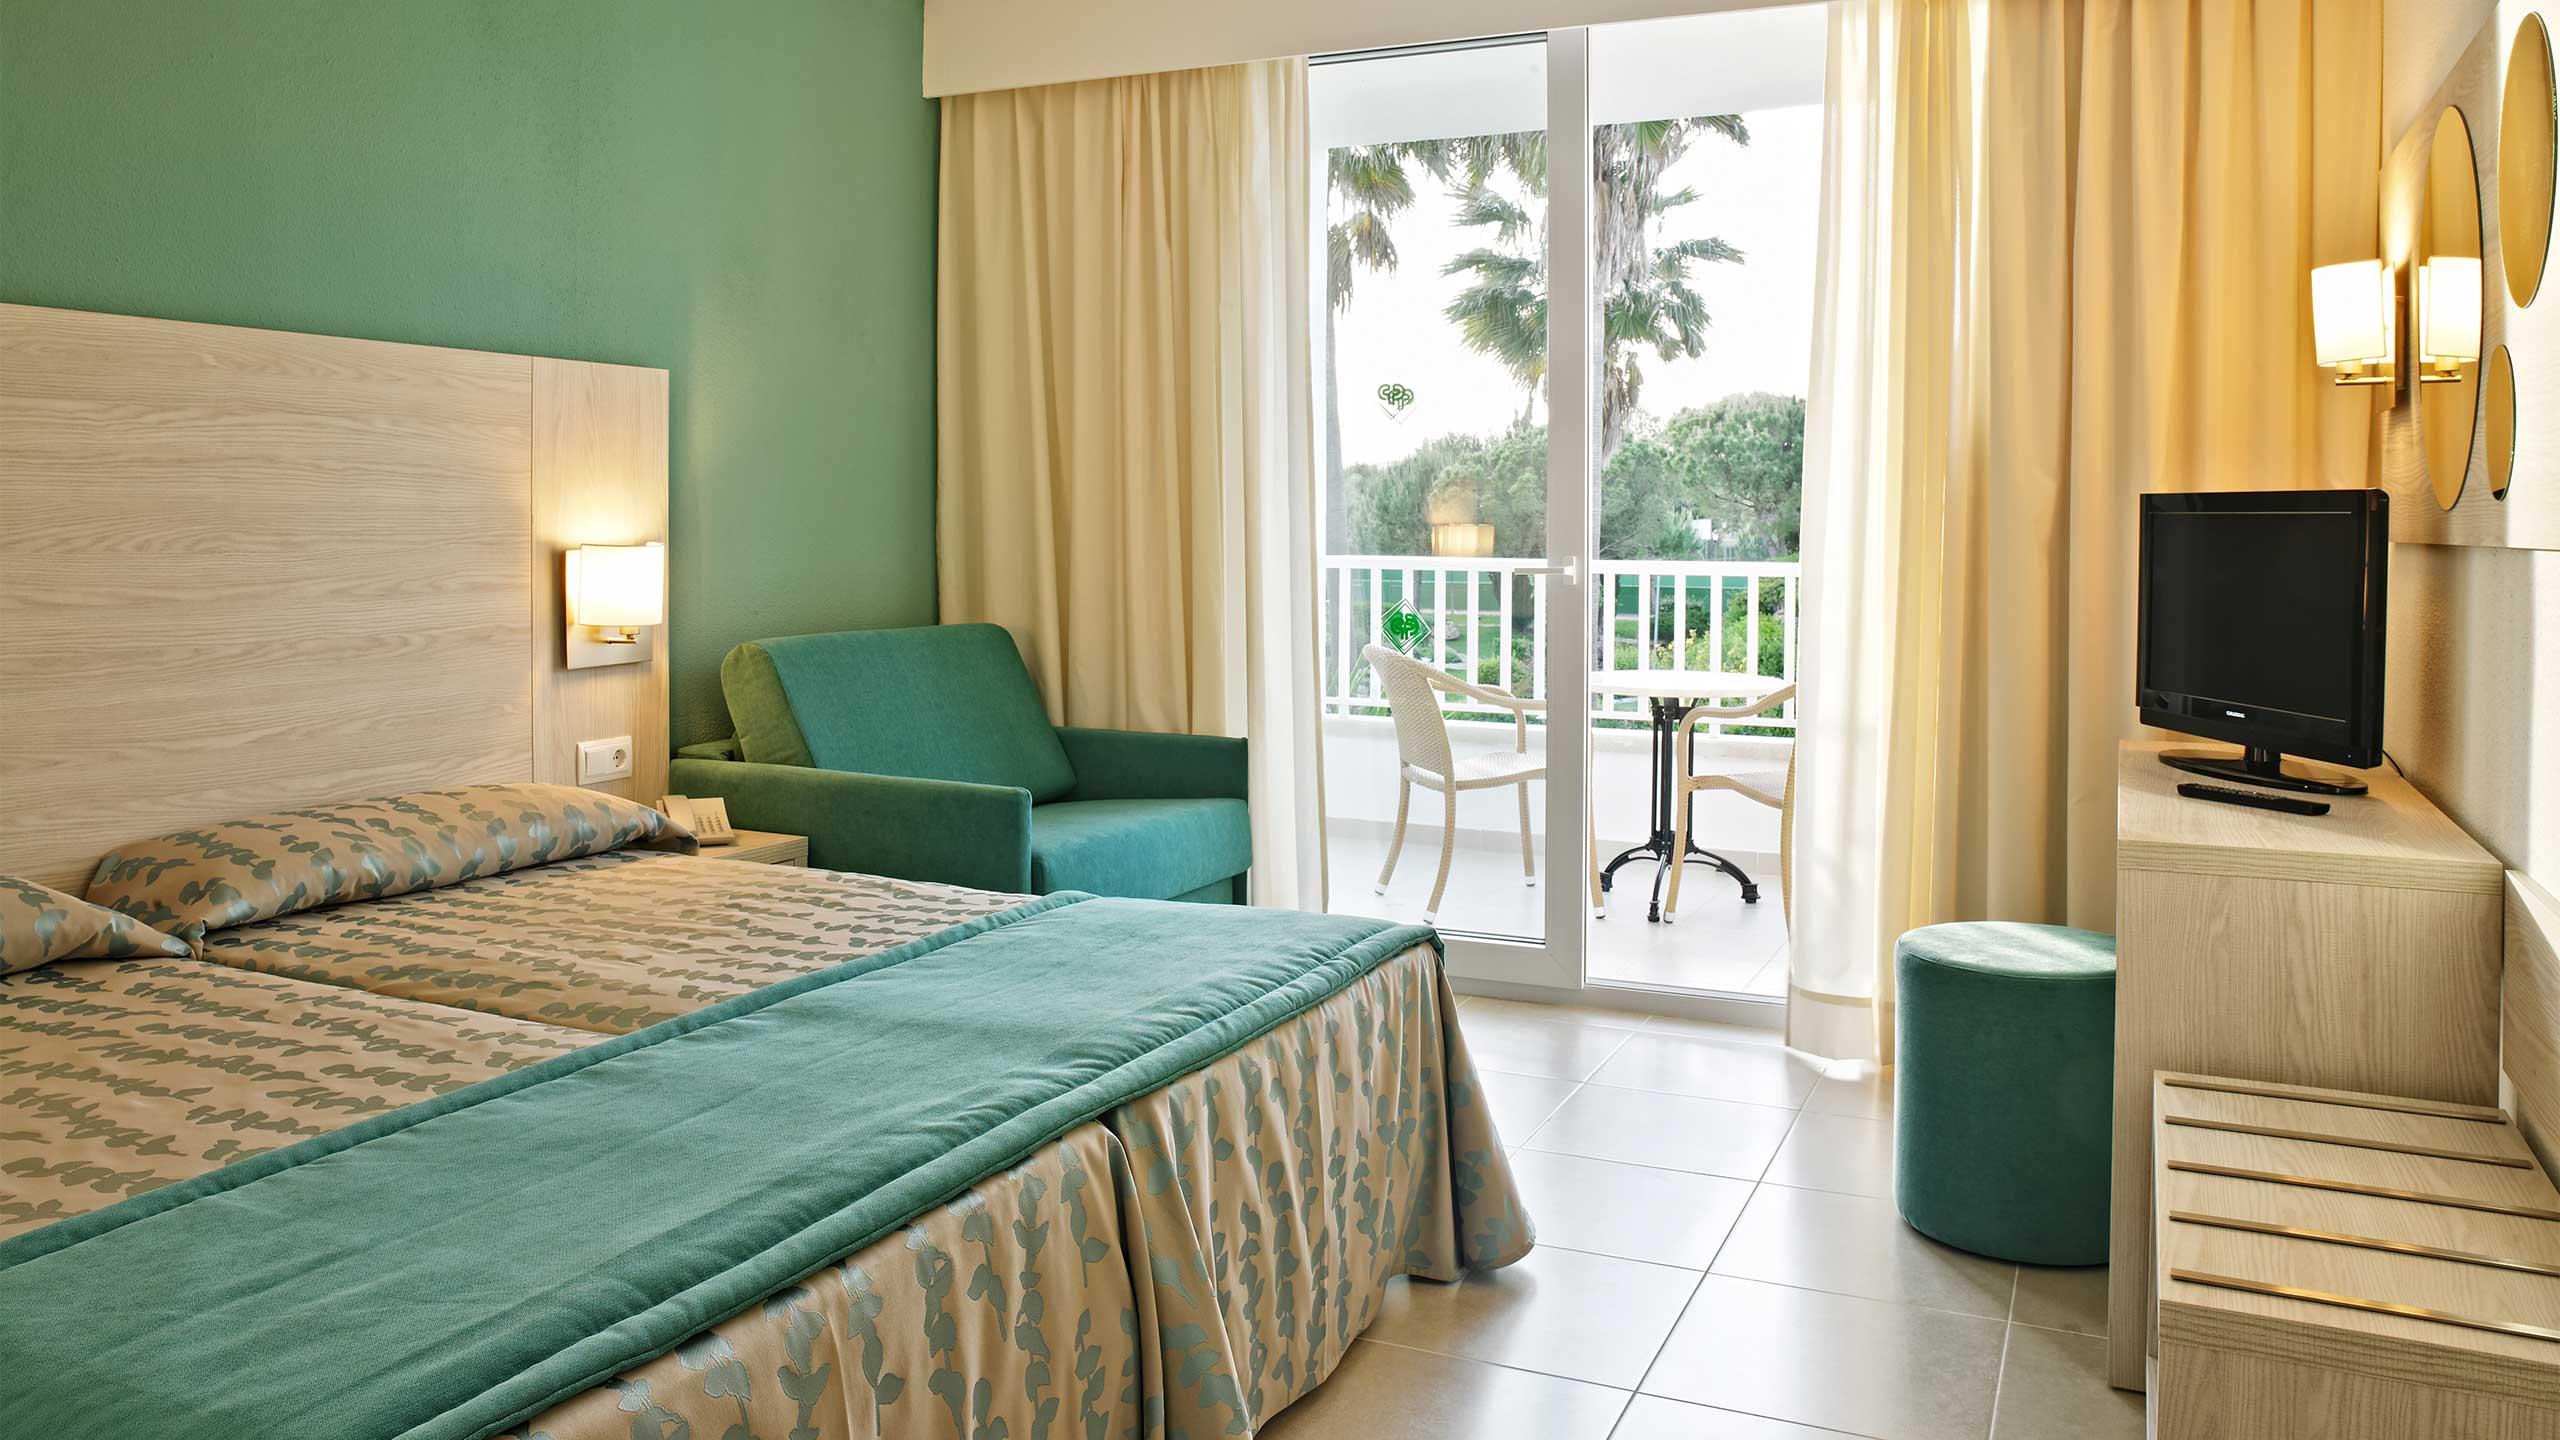 Rooms: Rooms & Apartments Protur Safari Park Aparthotel, Sa Coma Majorca